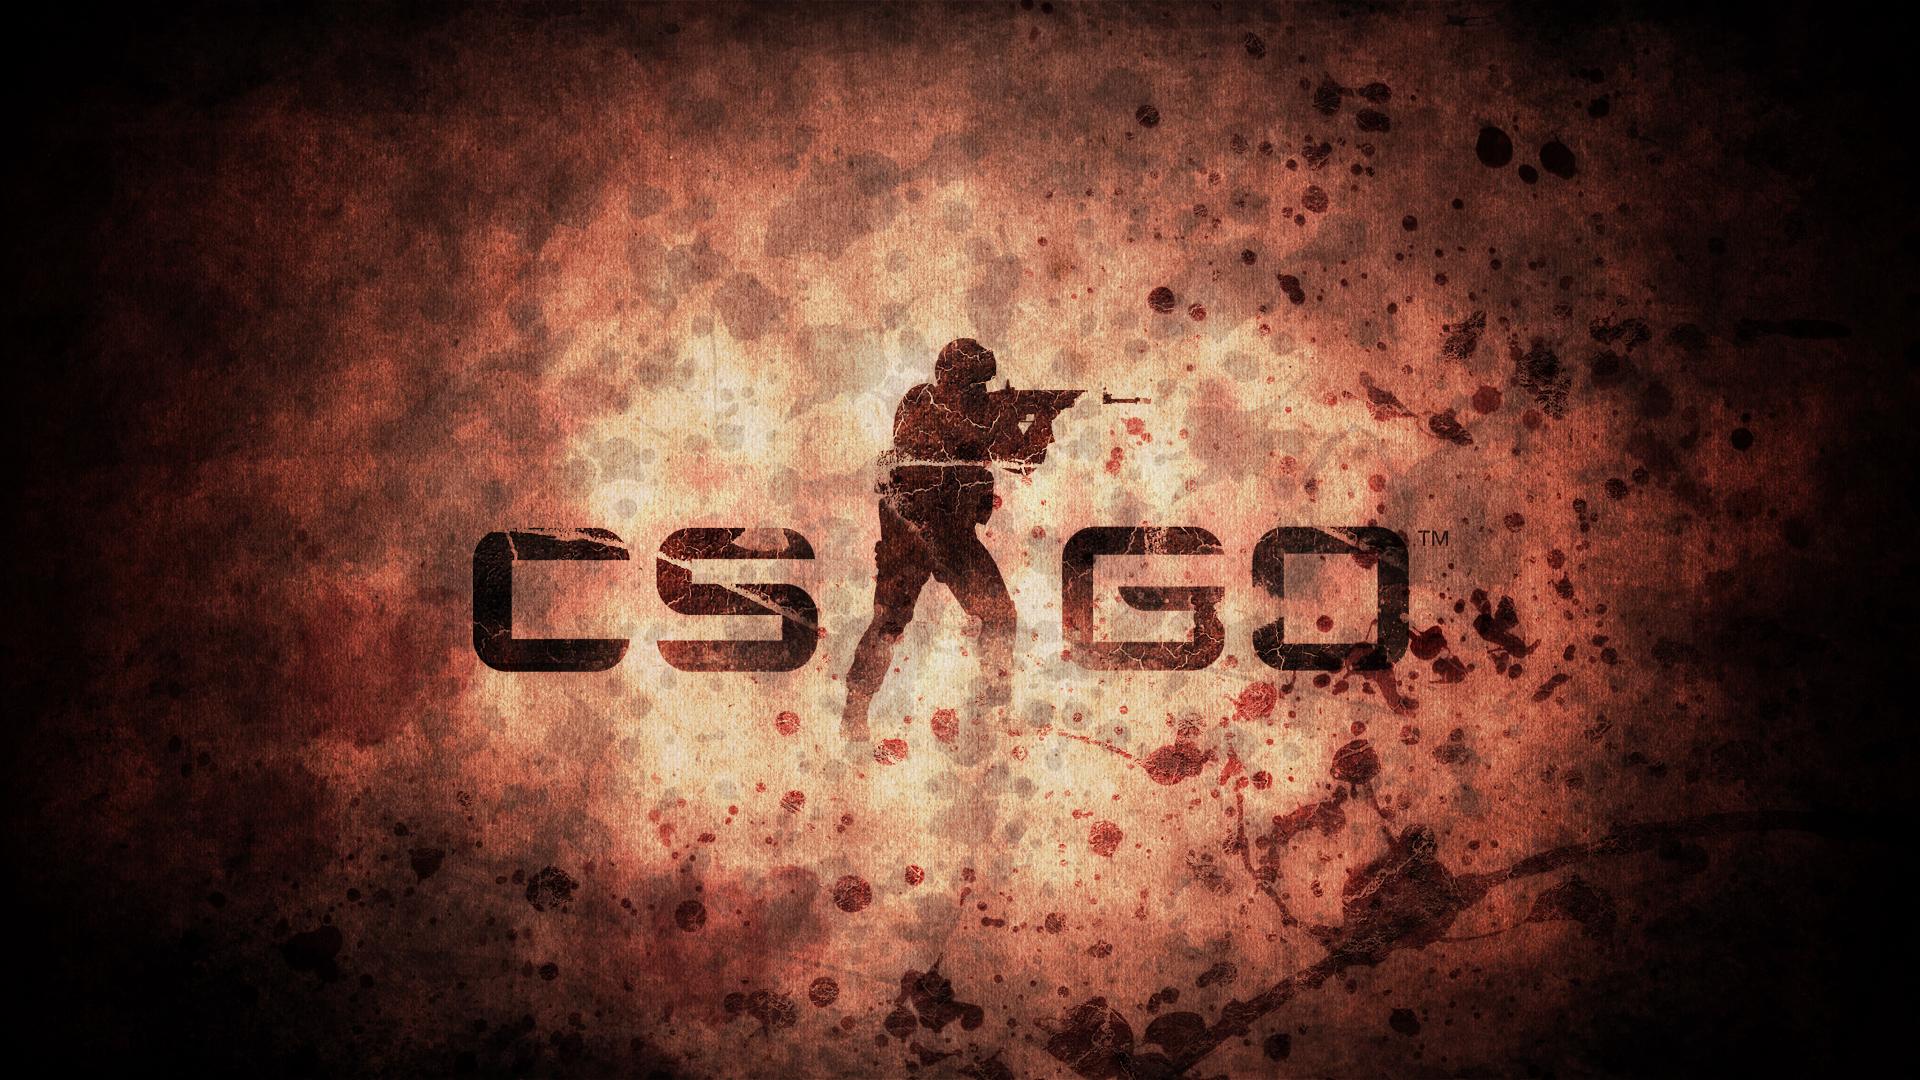 Counter strike global offensive wallpaper by lenkrad d5us86r jpg 1920x1080